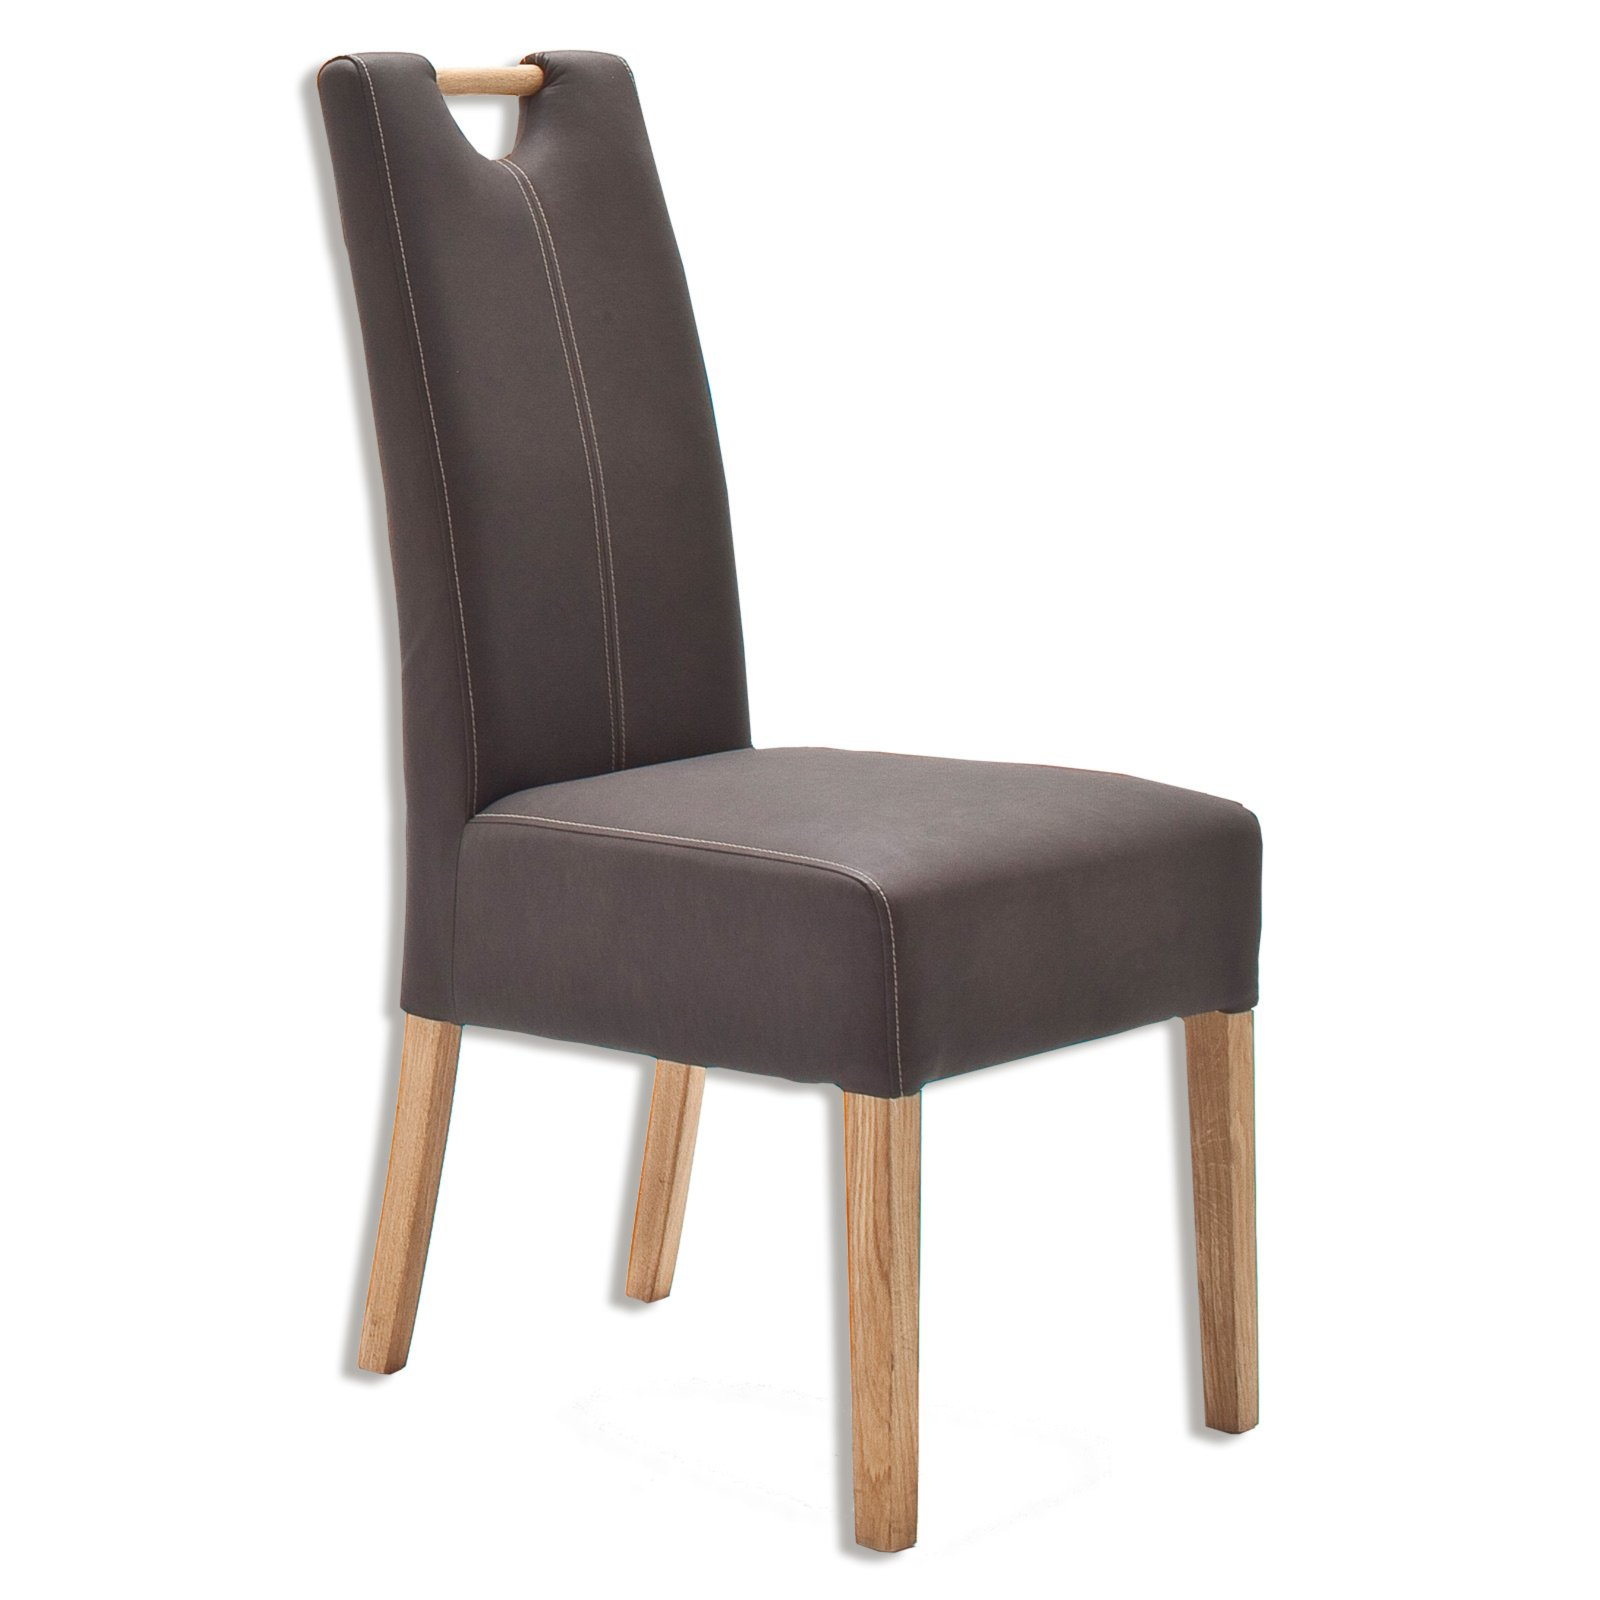 ROLLER Stuhl ELIDA Eiche Massiv Braun Kunstleder